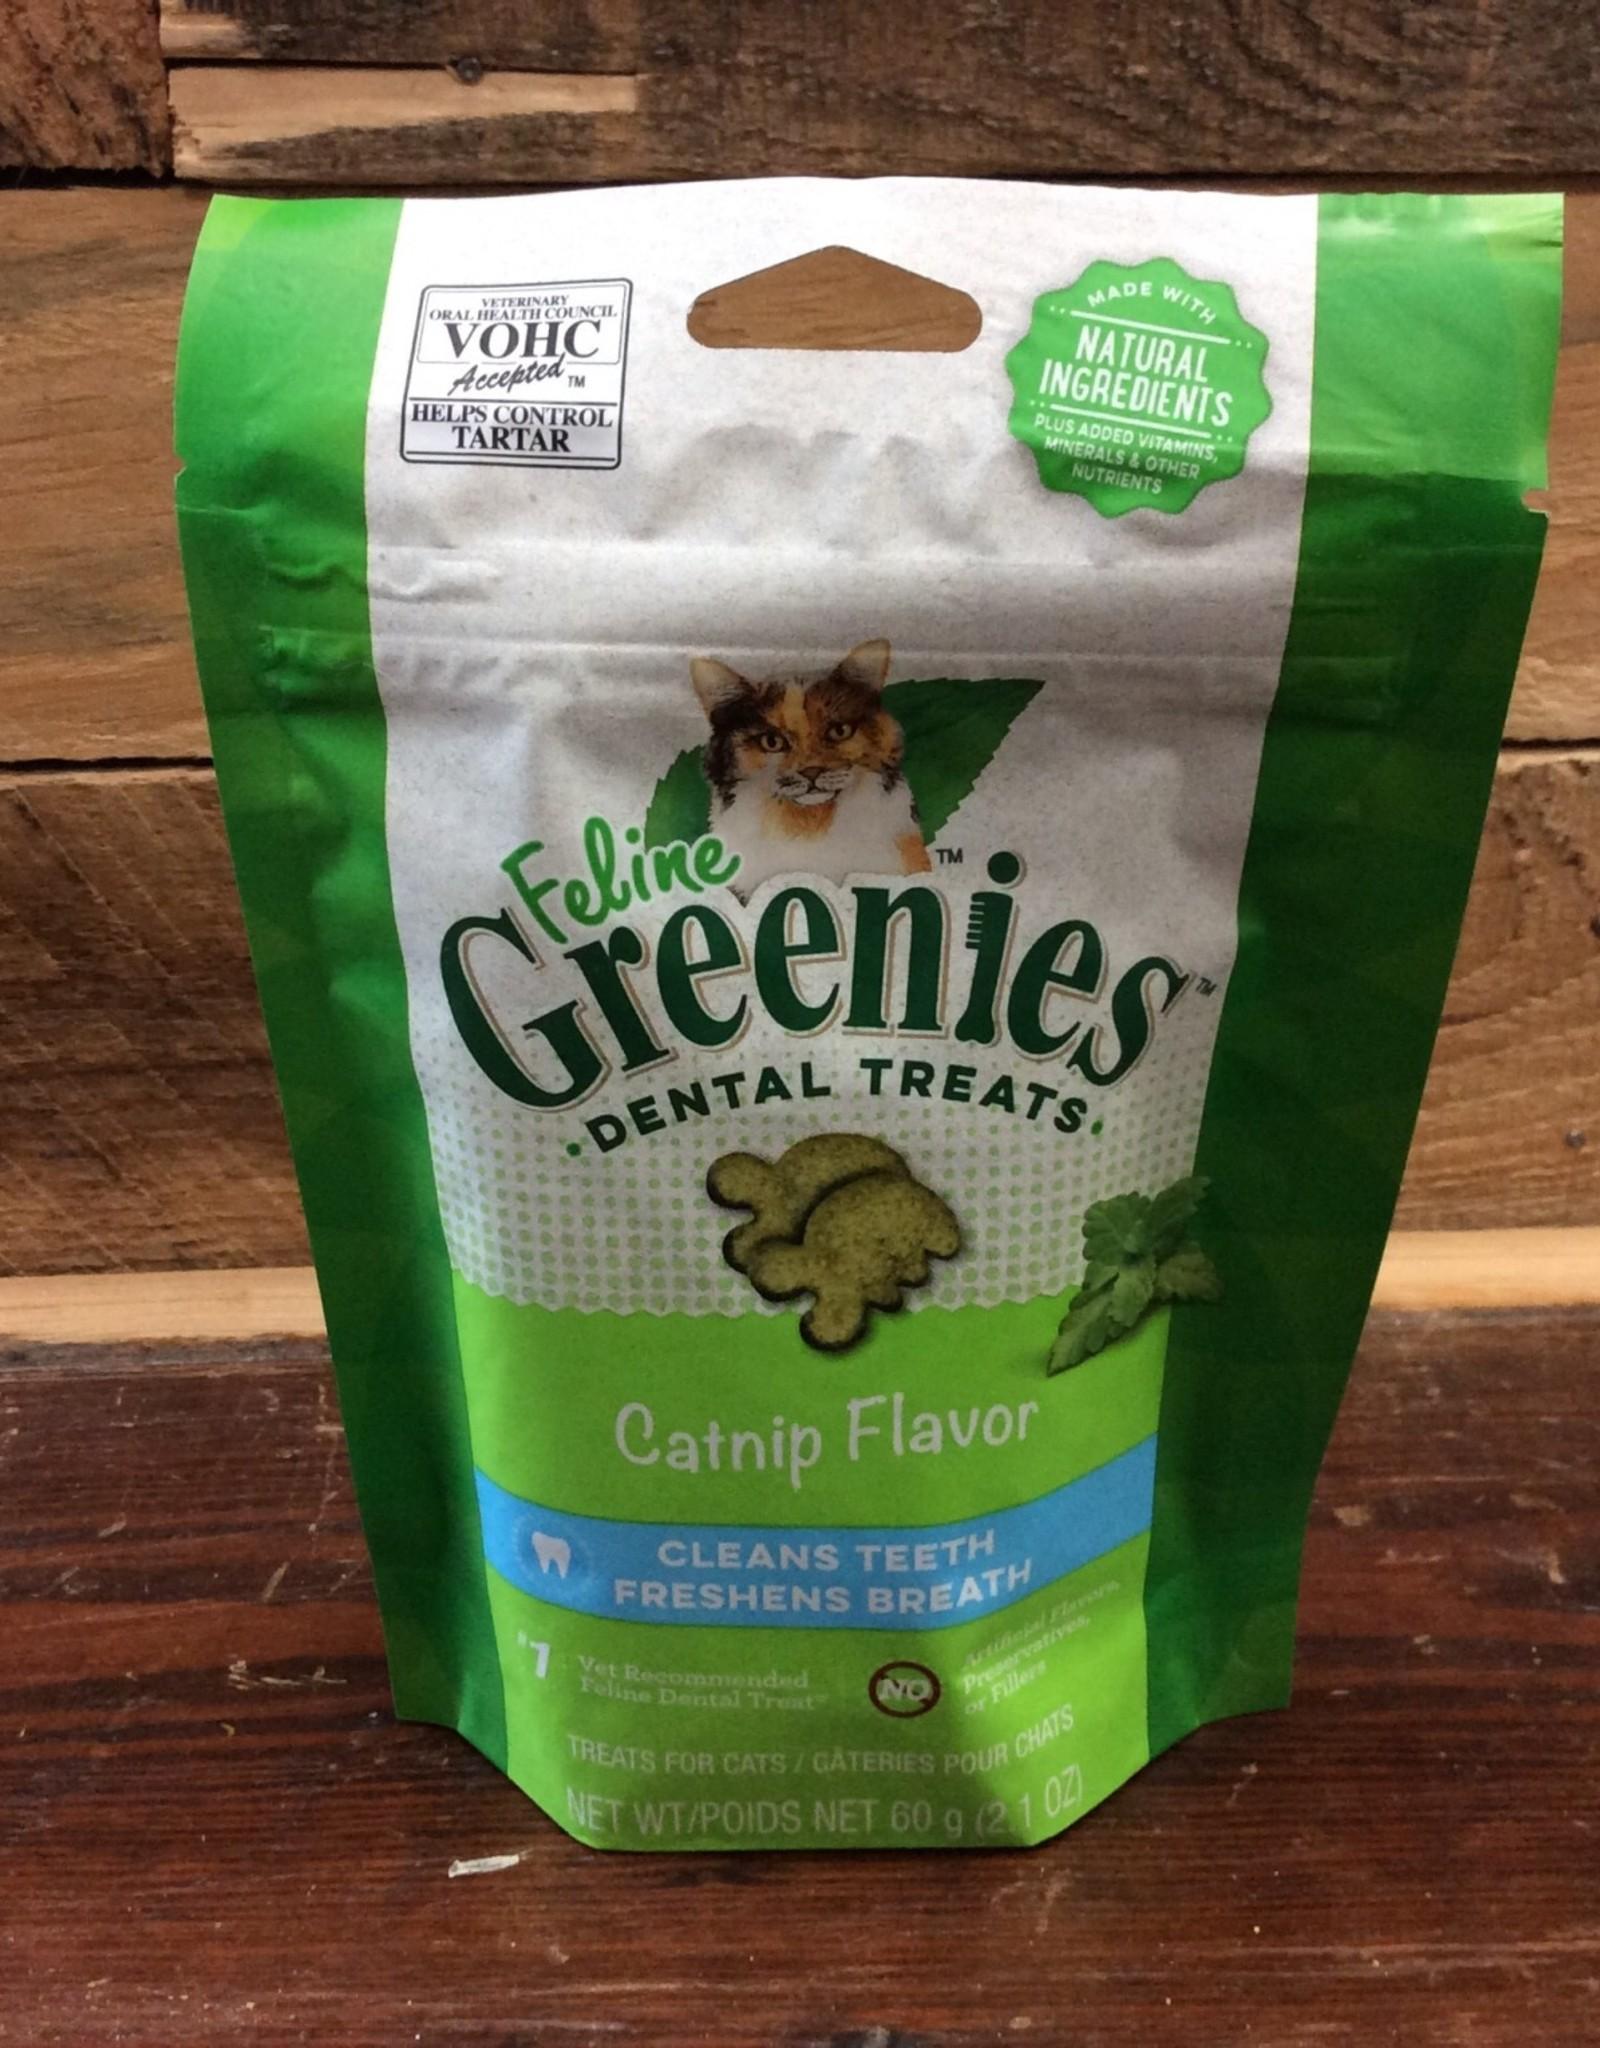 Greenies Feline Dental Treat 2.1oz Catnip